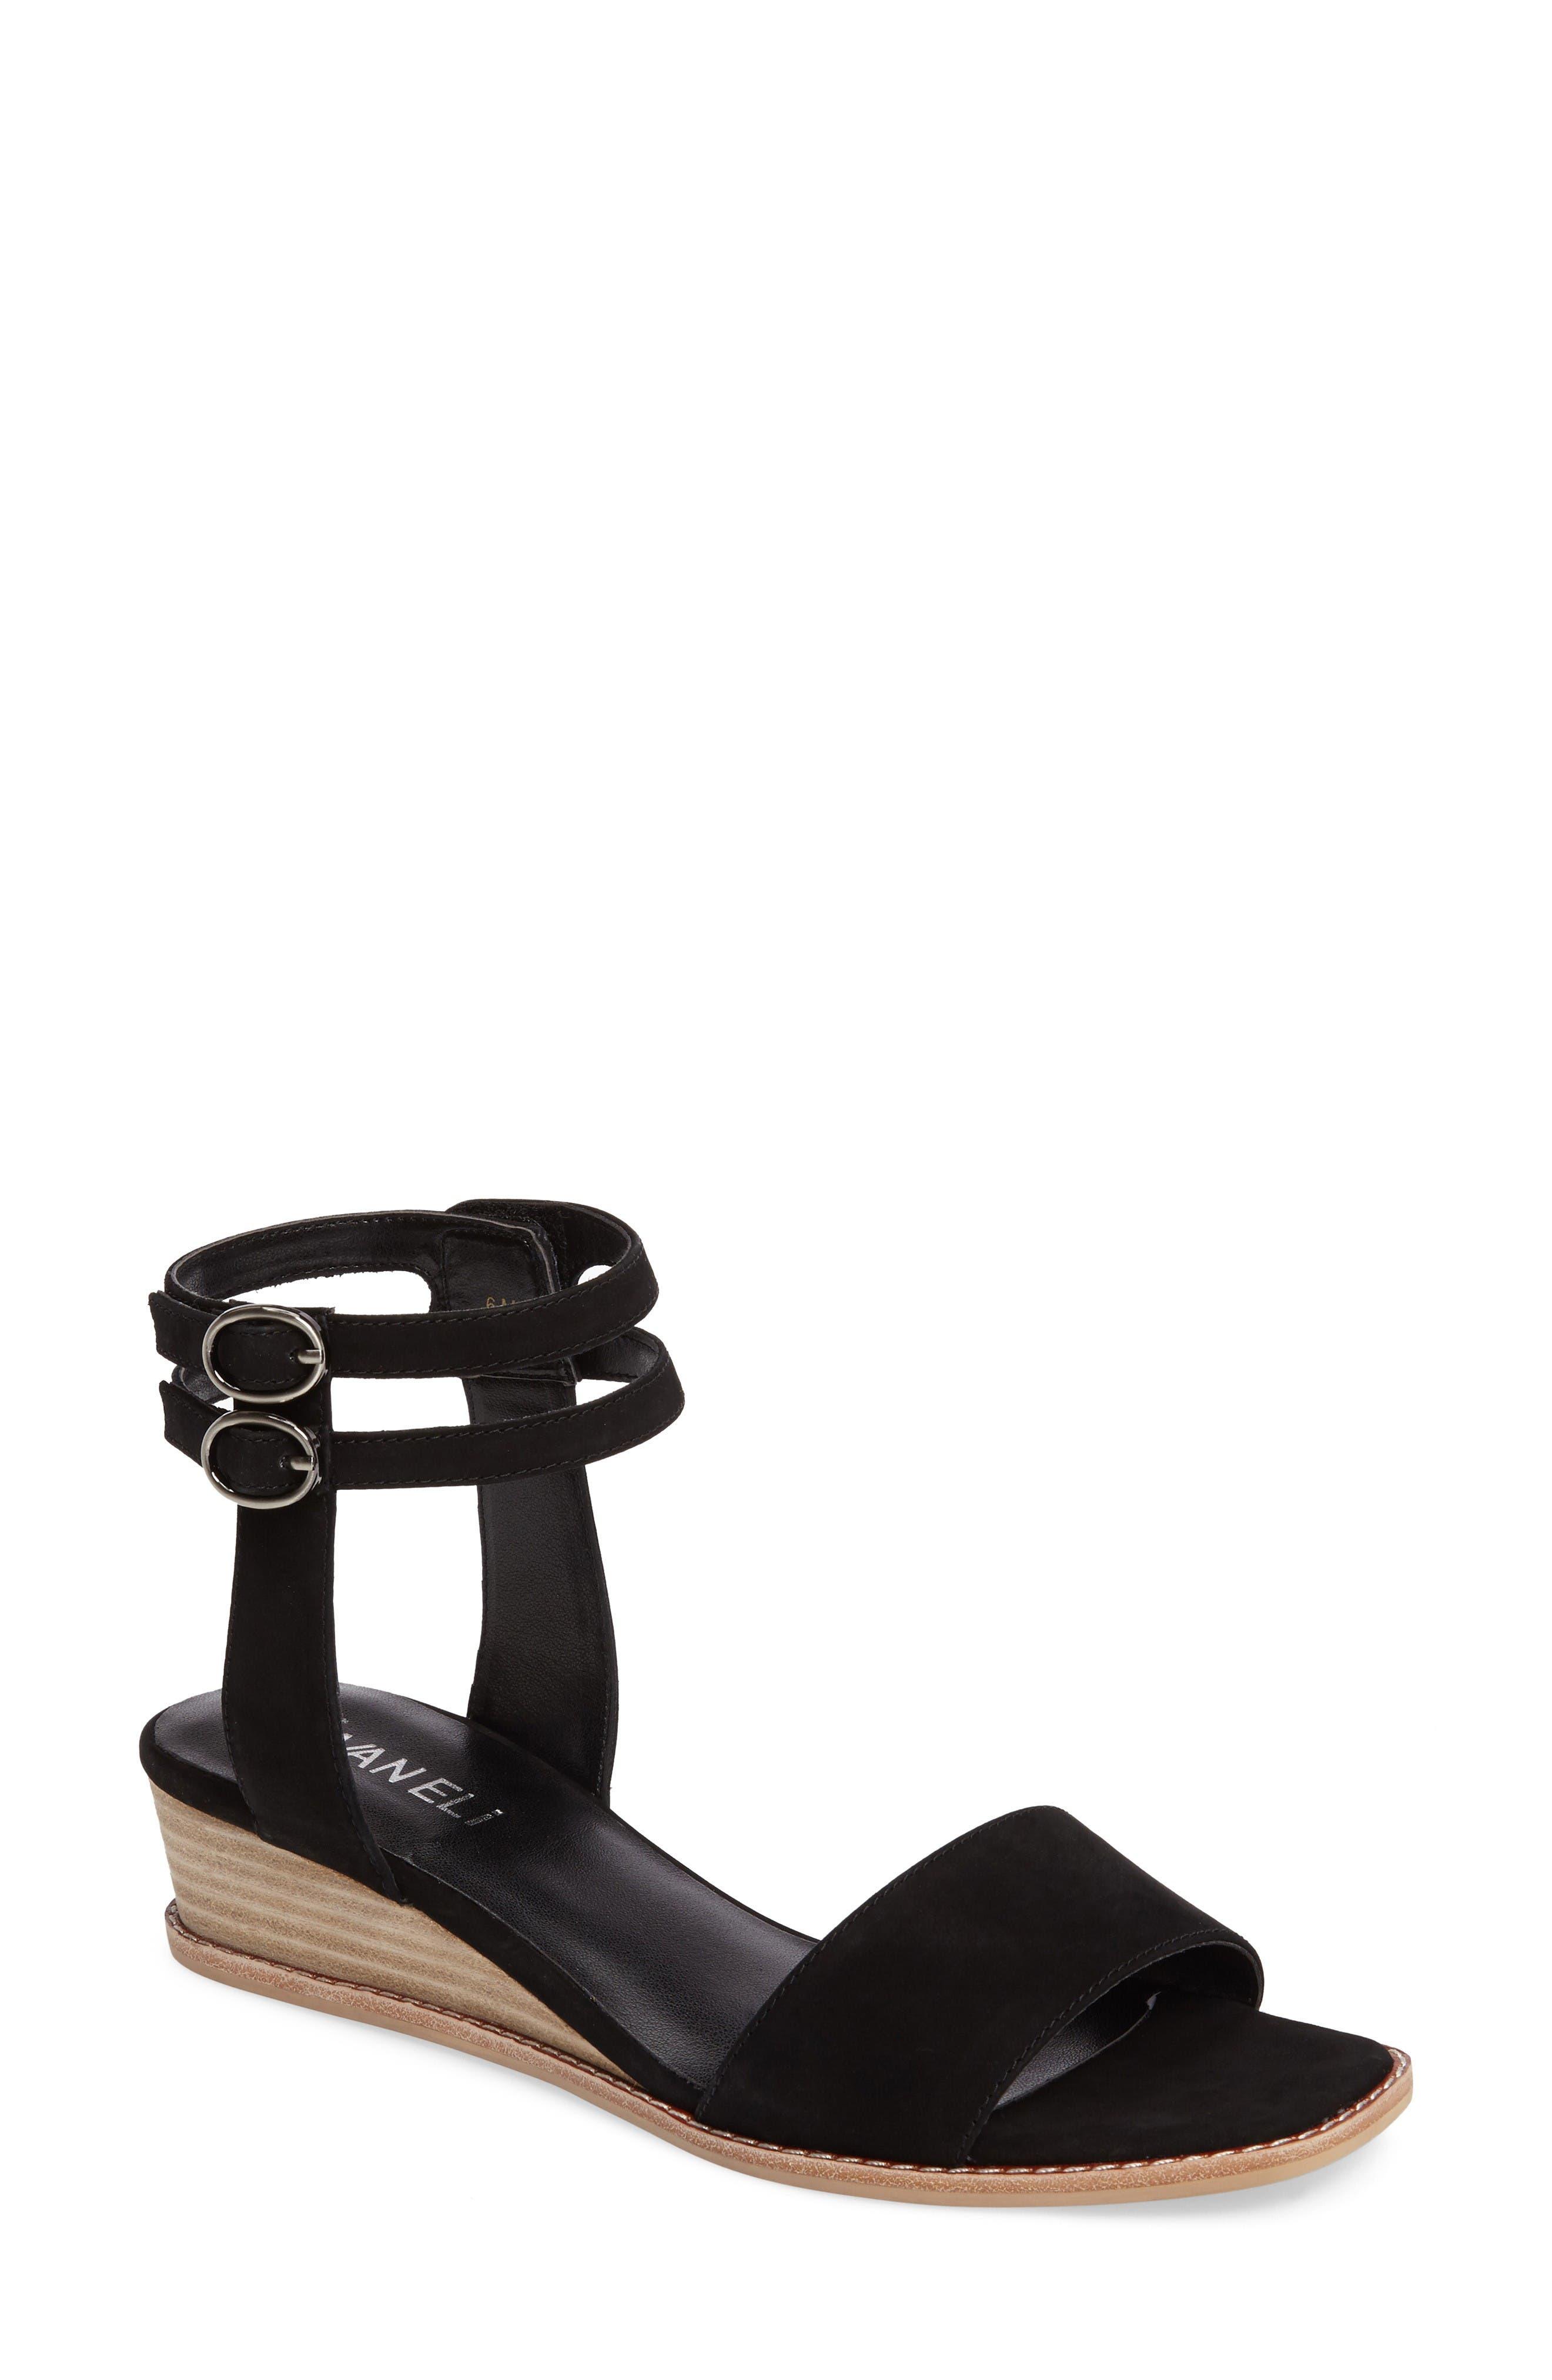 Jarita Ankle Strap Sandal,                             Main thumbnail 1, color,                             Black Leather